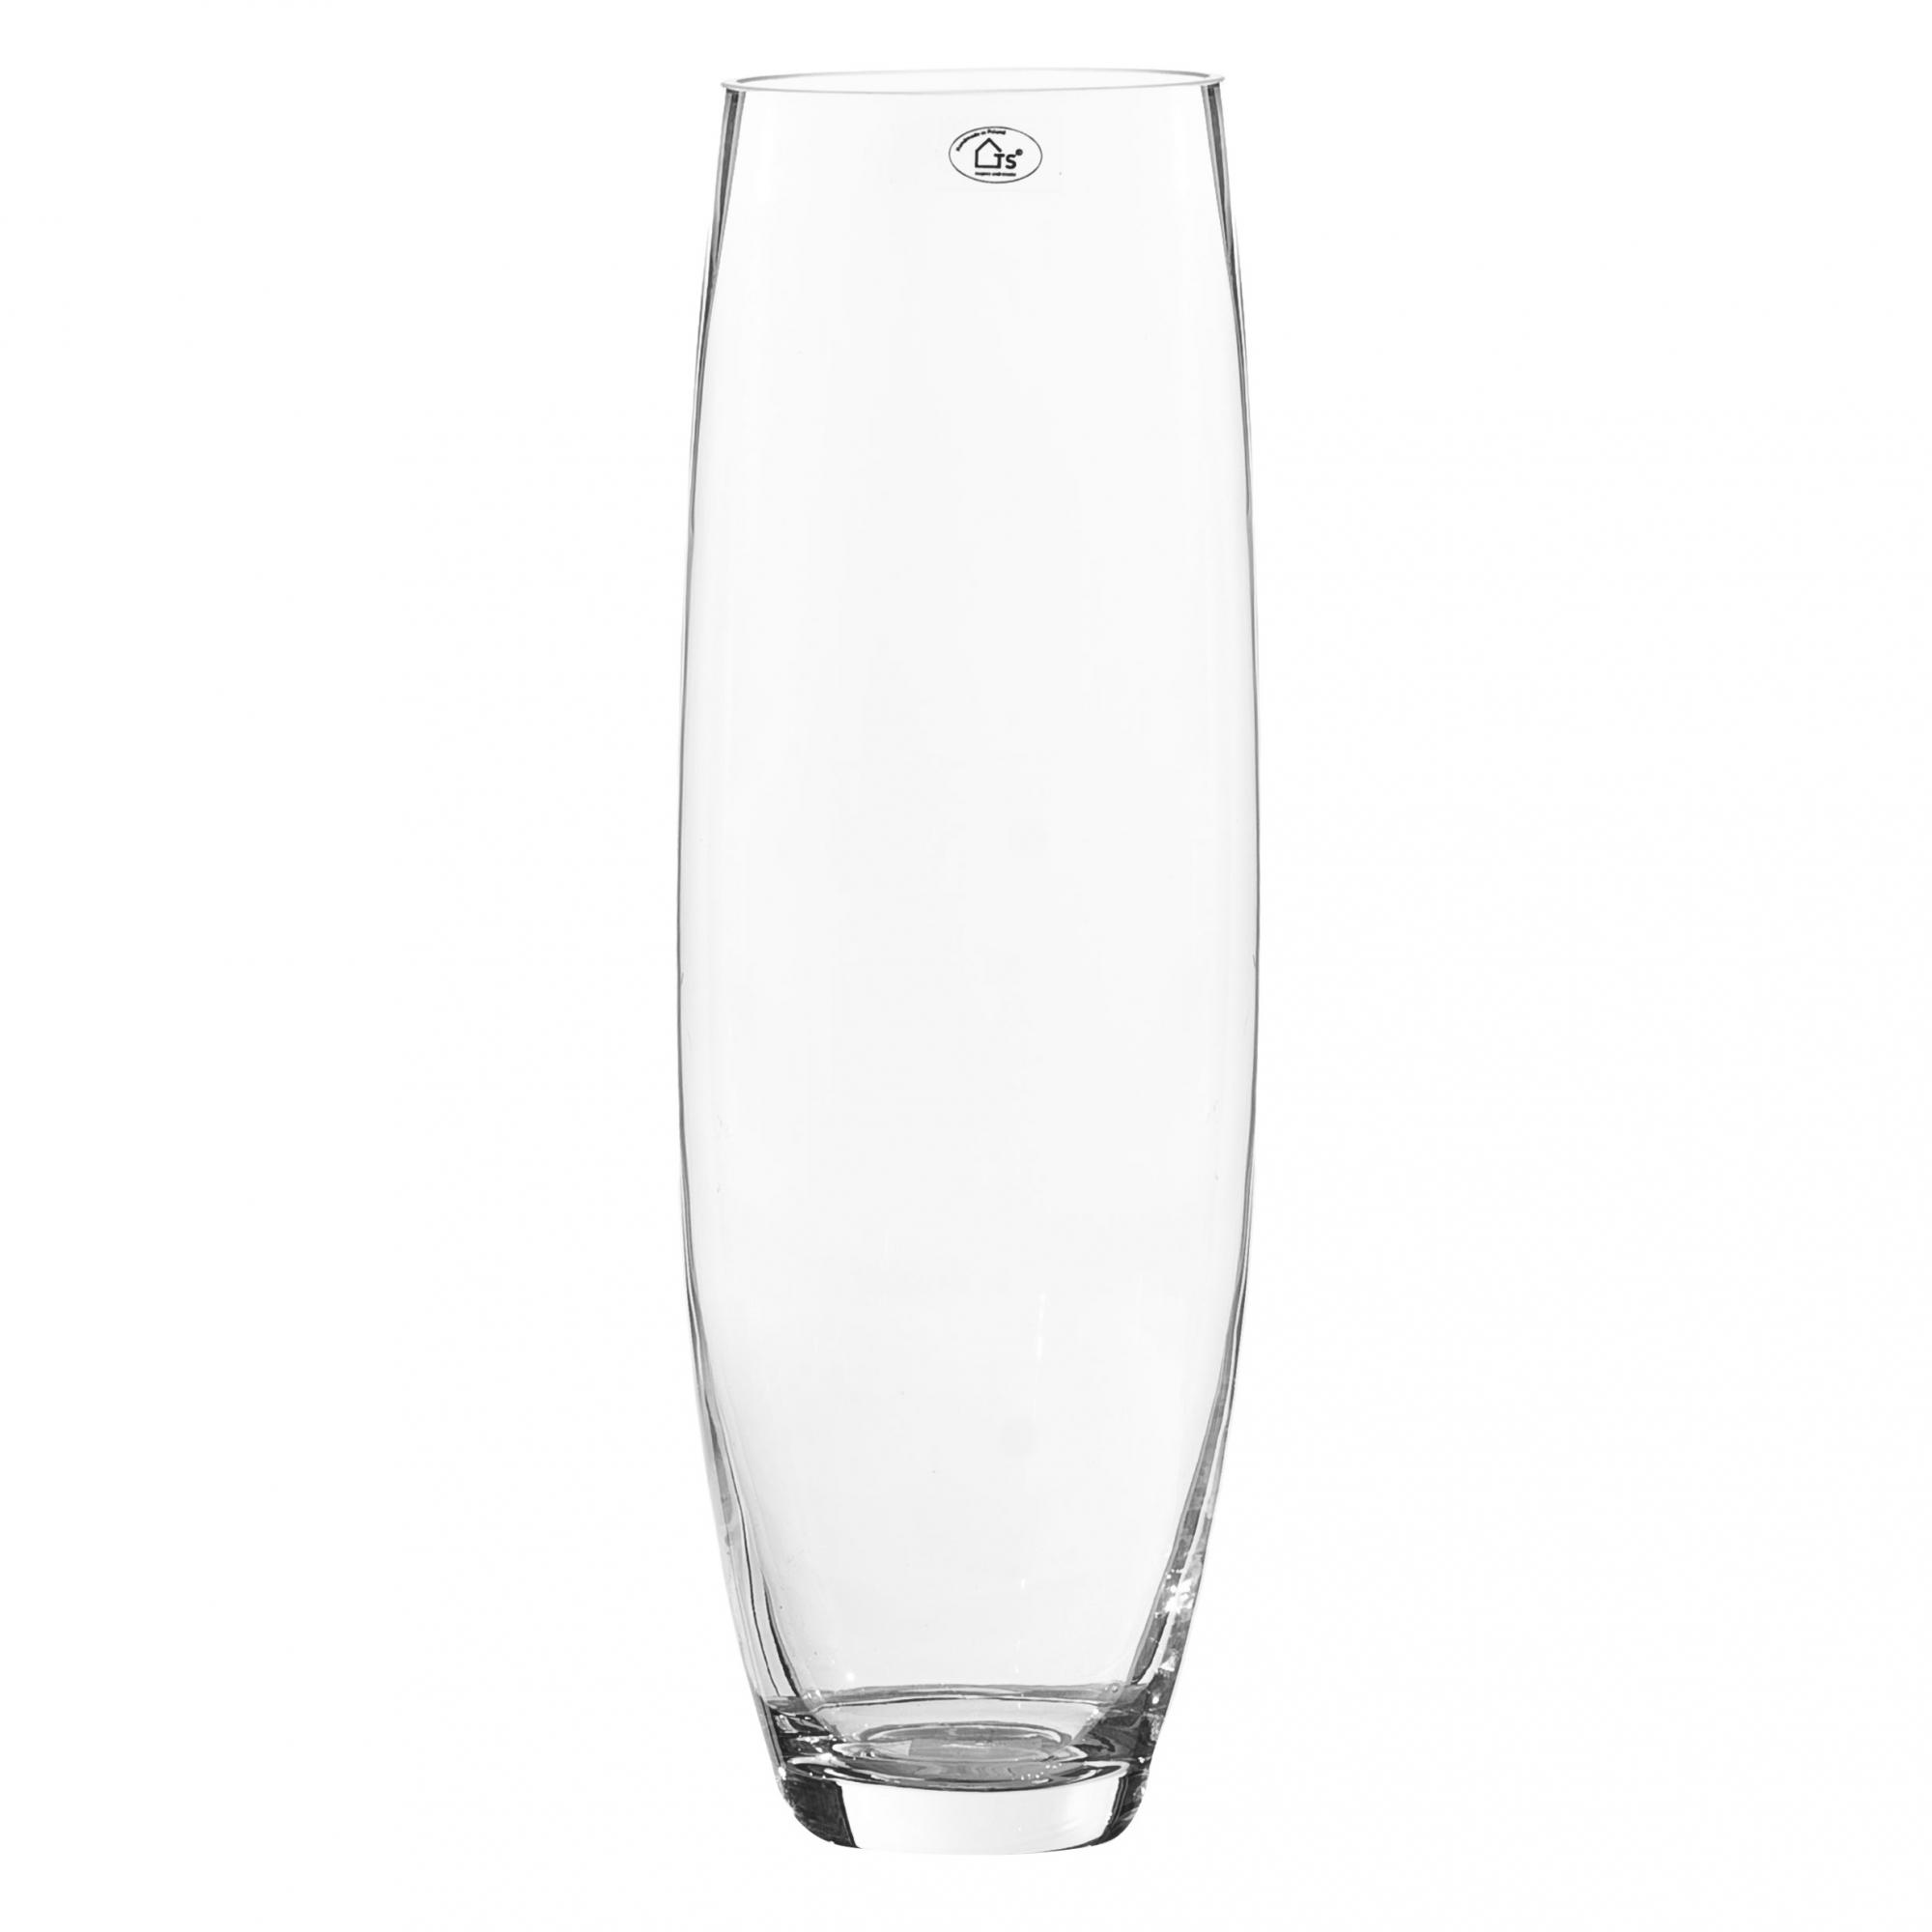 Vaso de Vidro Artesanal Polonês Banan 15X45cm